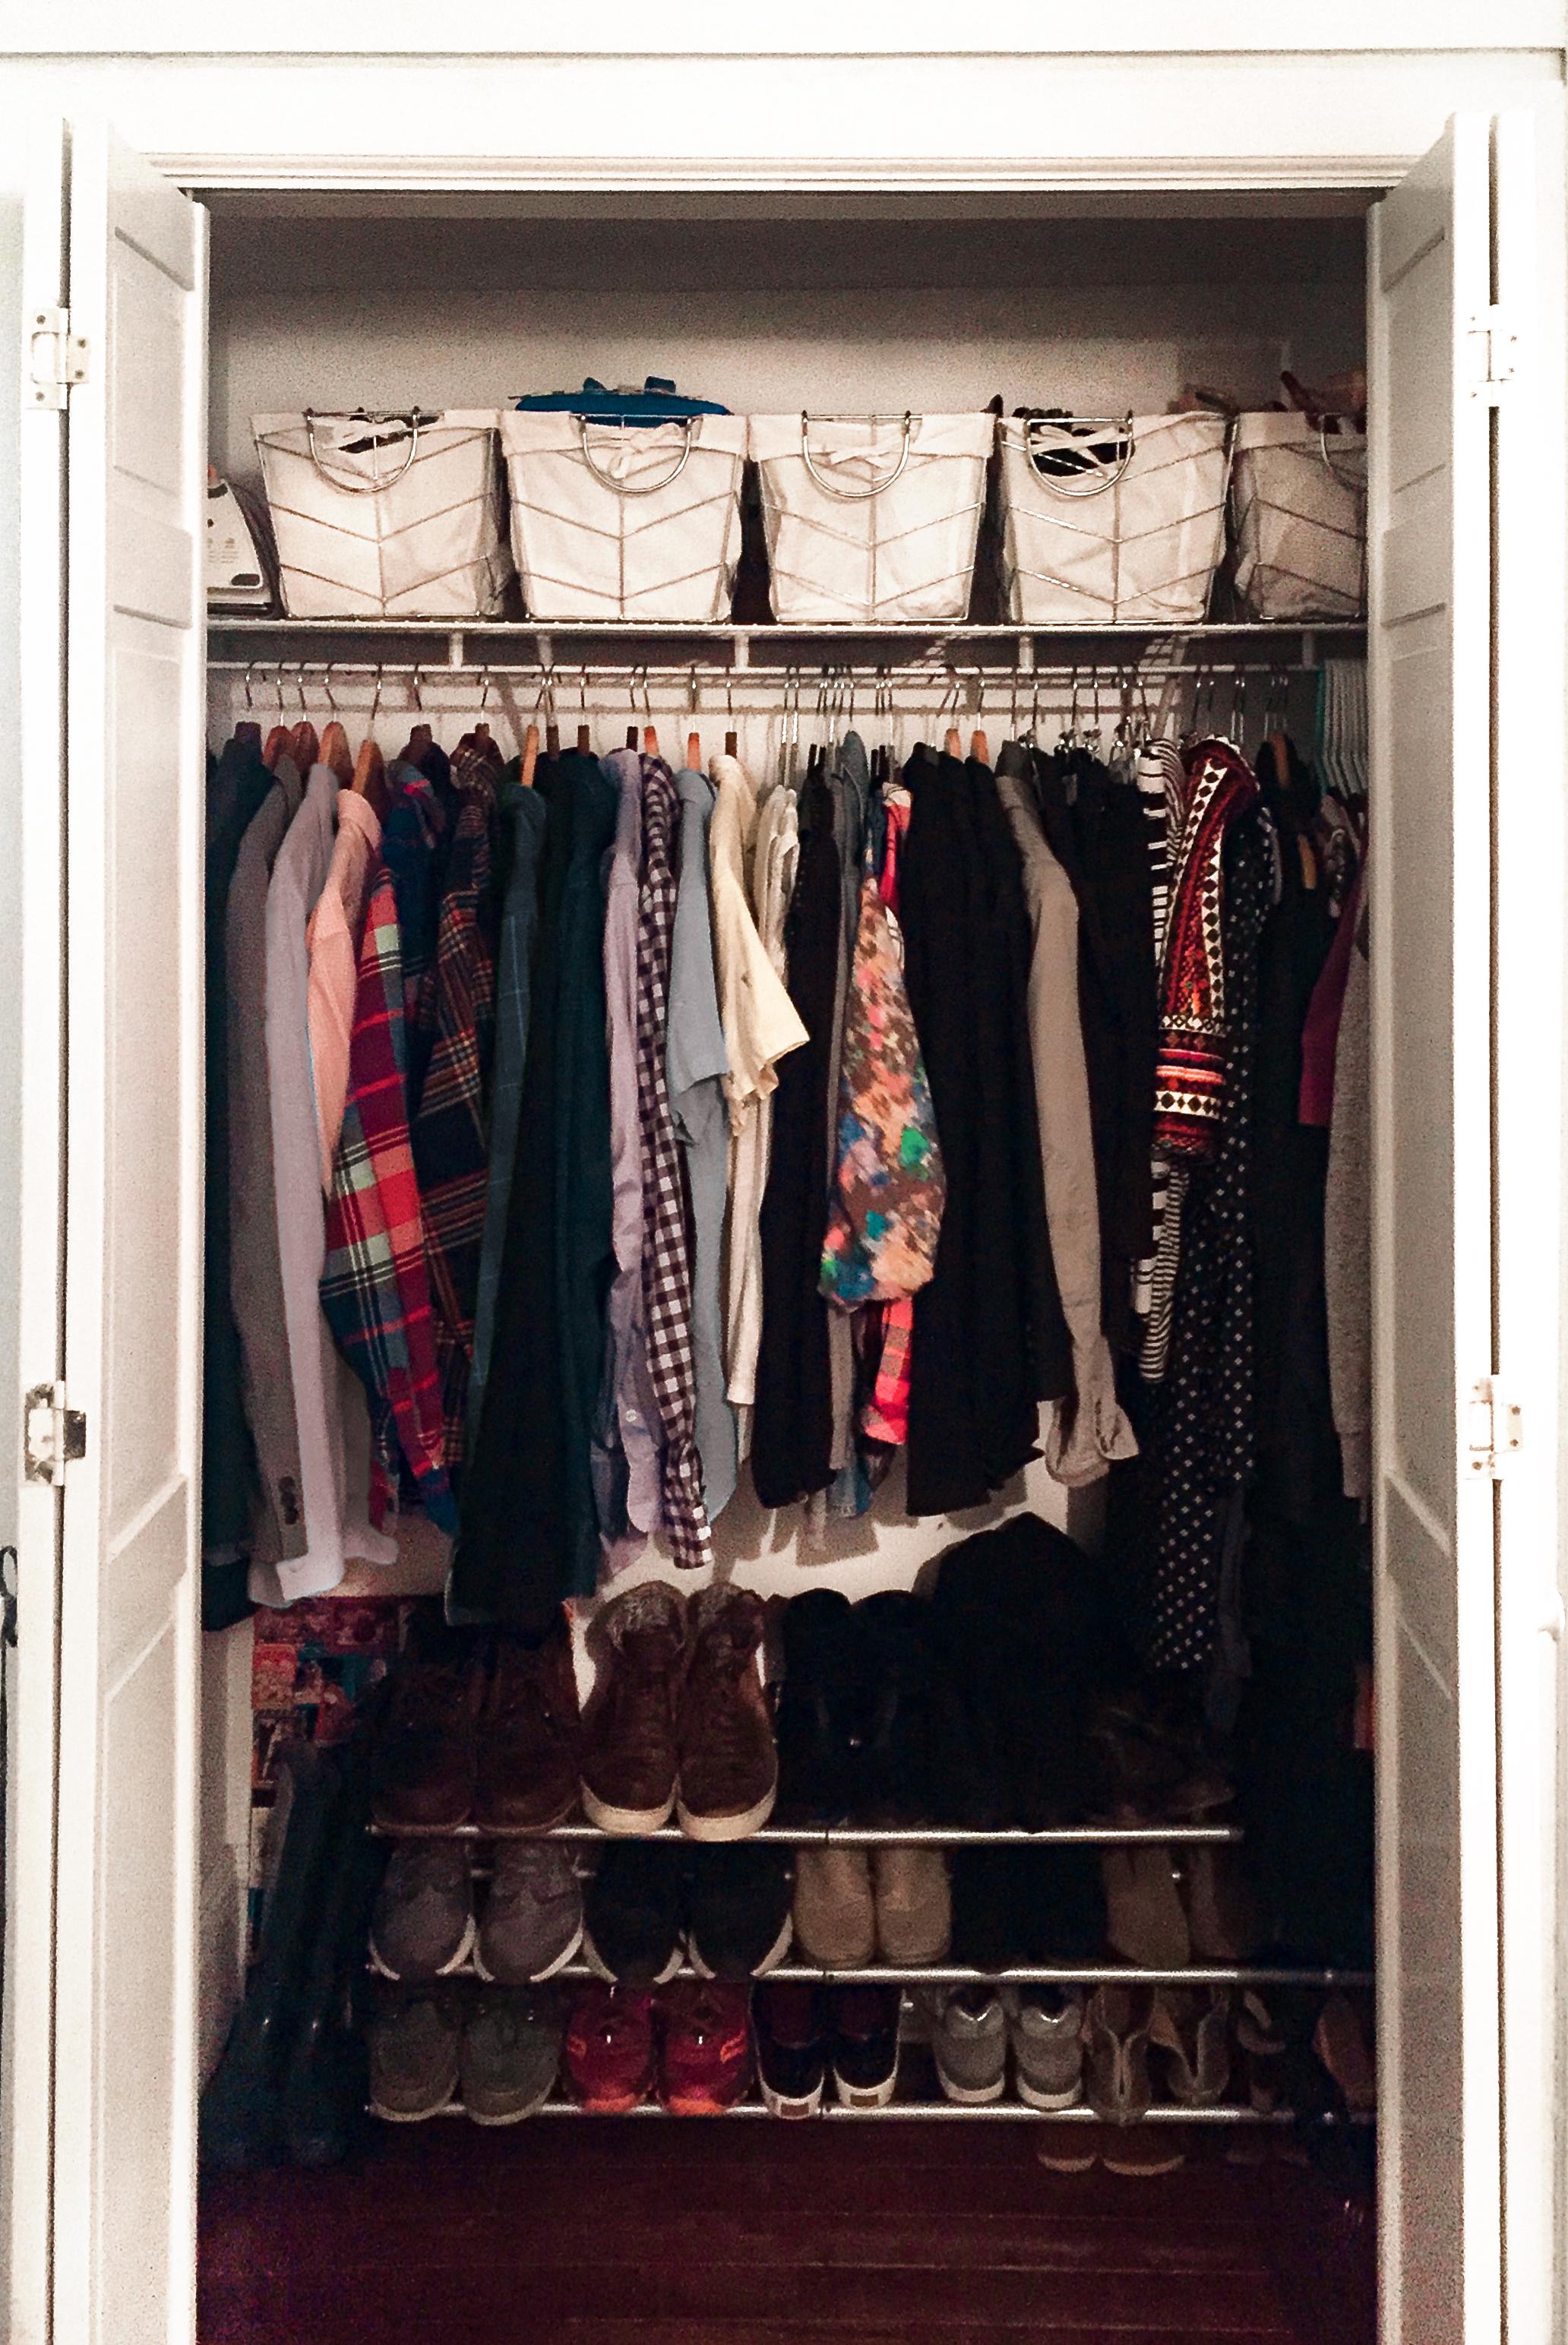 15cc closet after.jpg